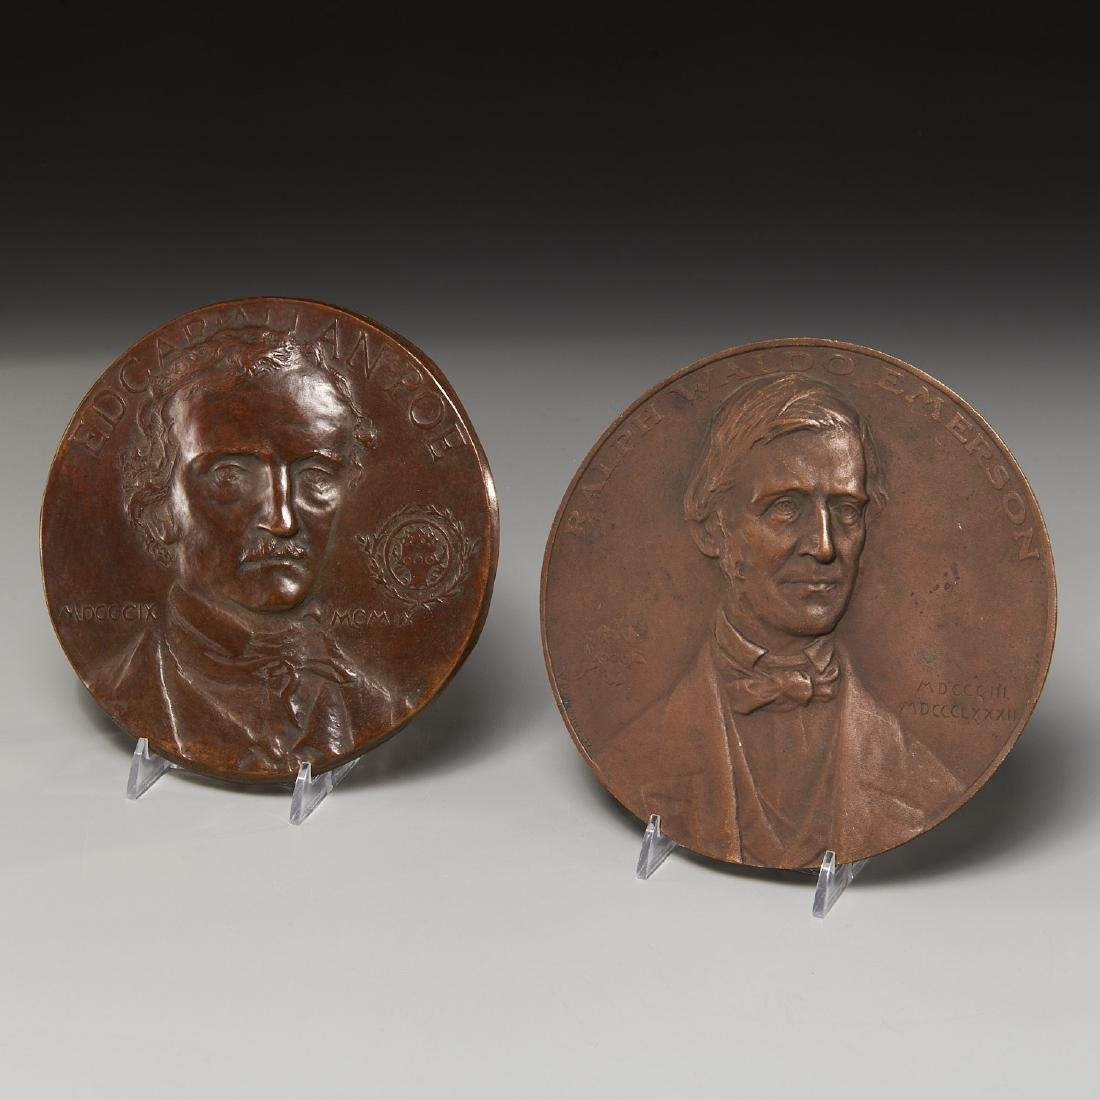 (2) Groliers Club commemorative medals